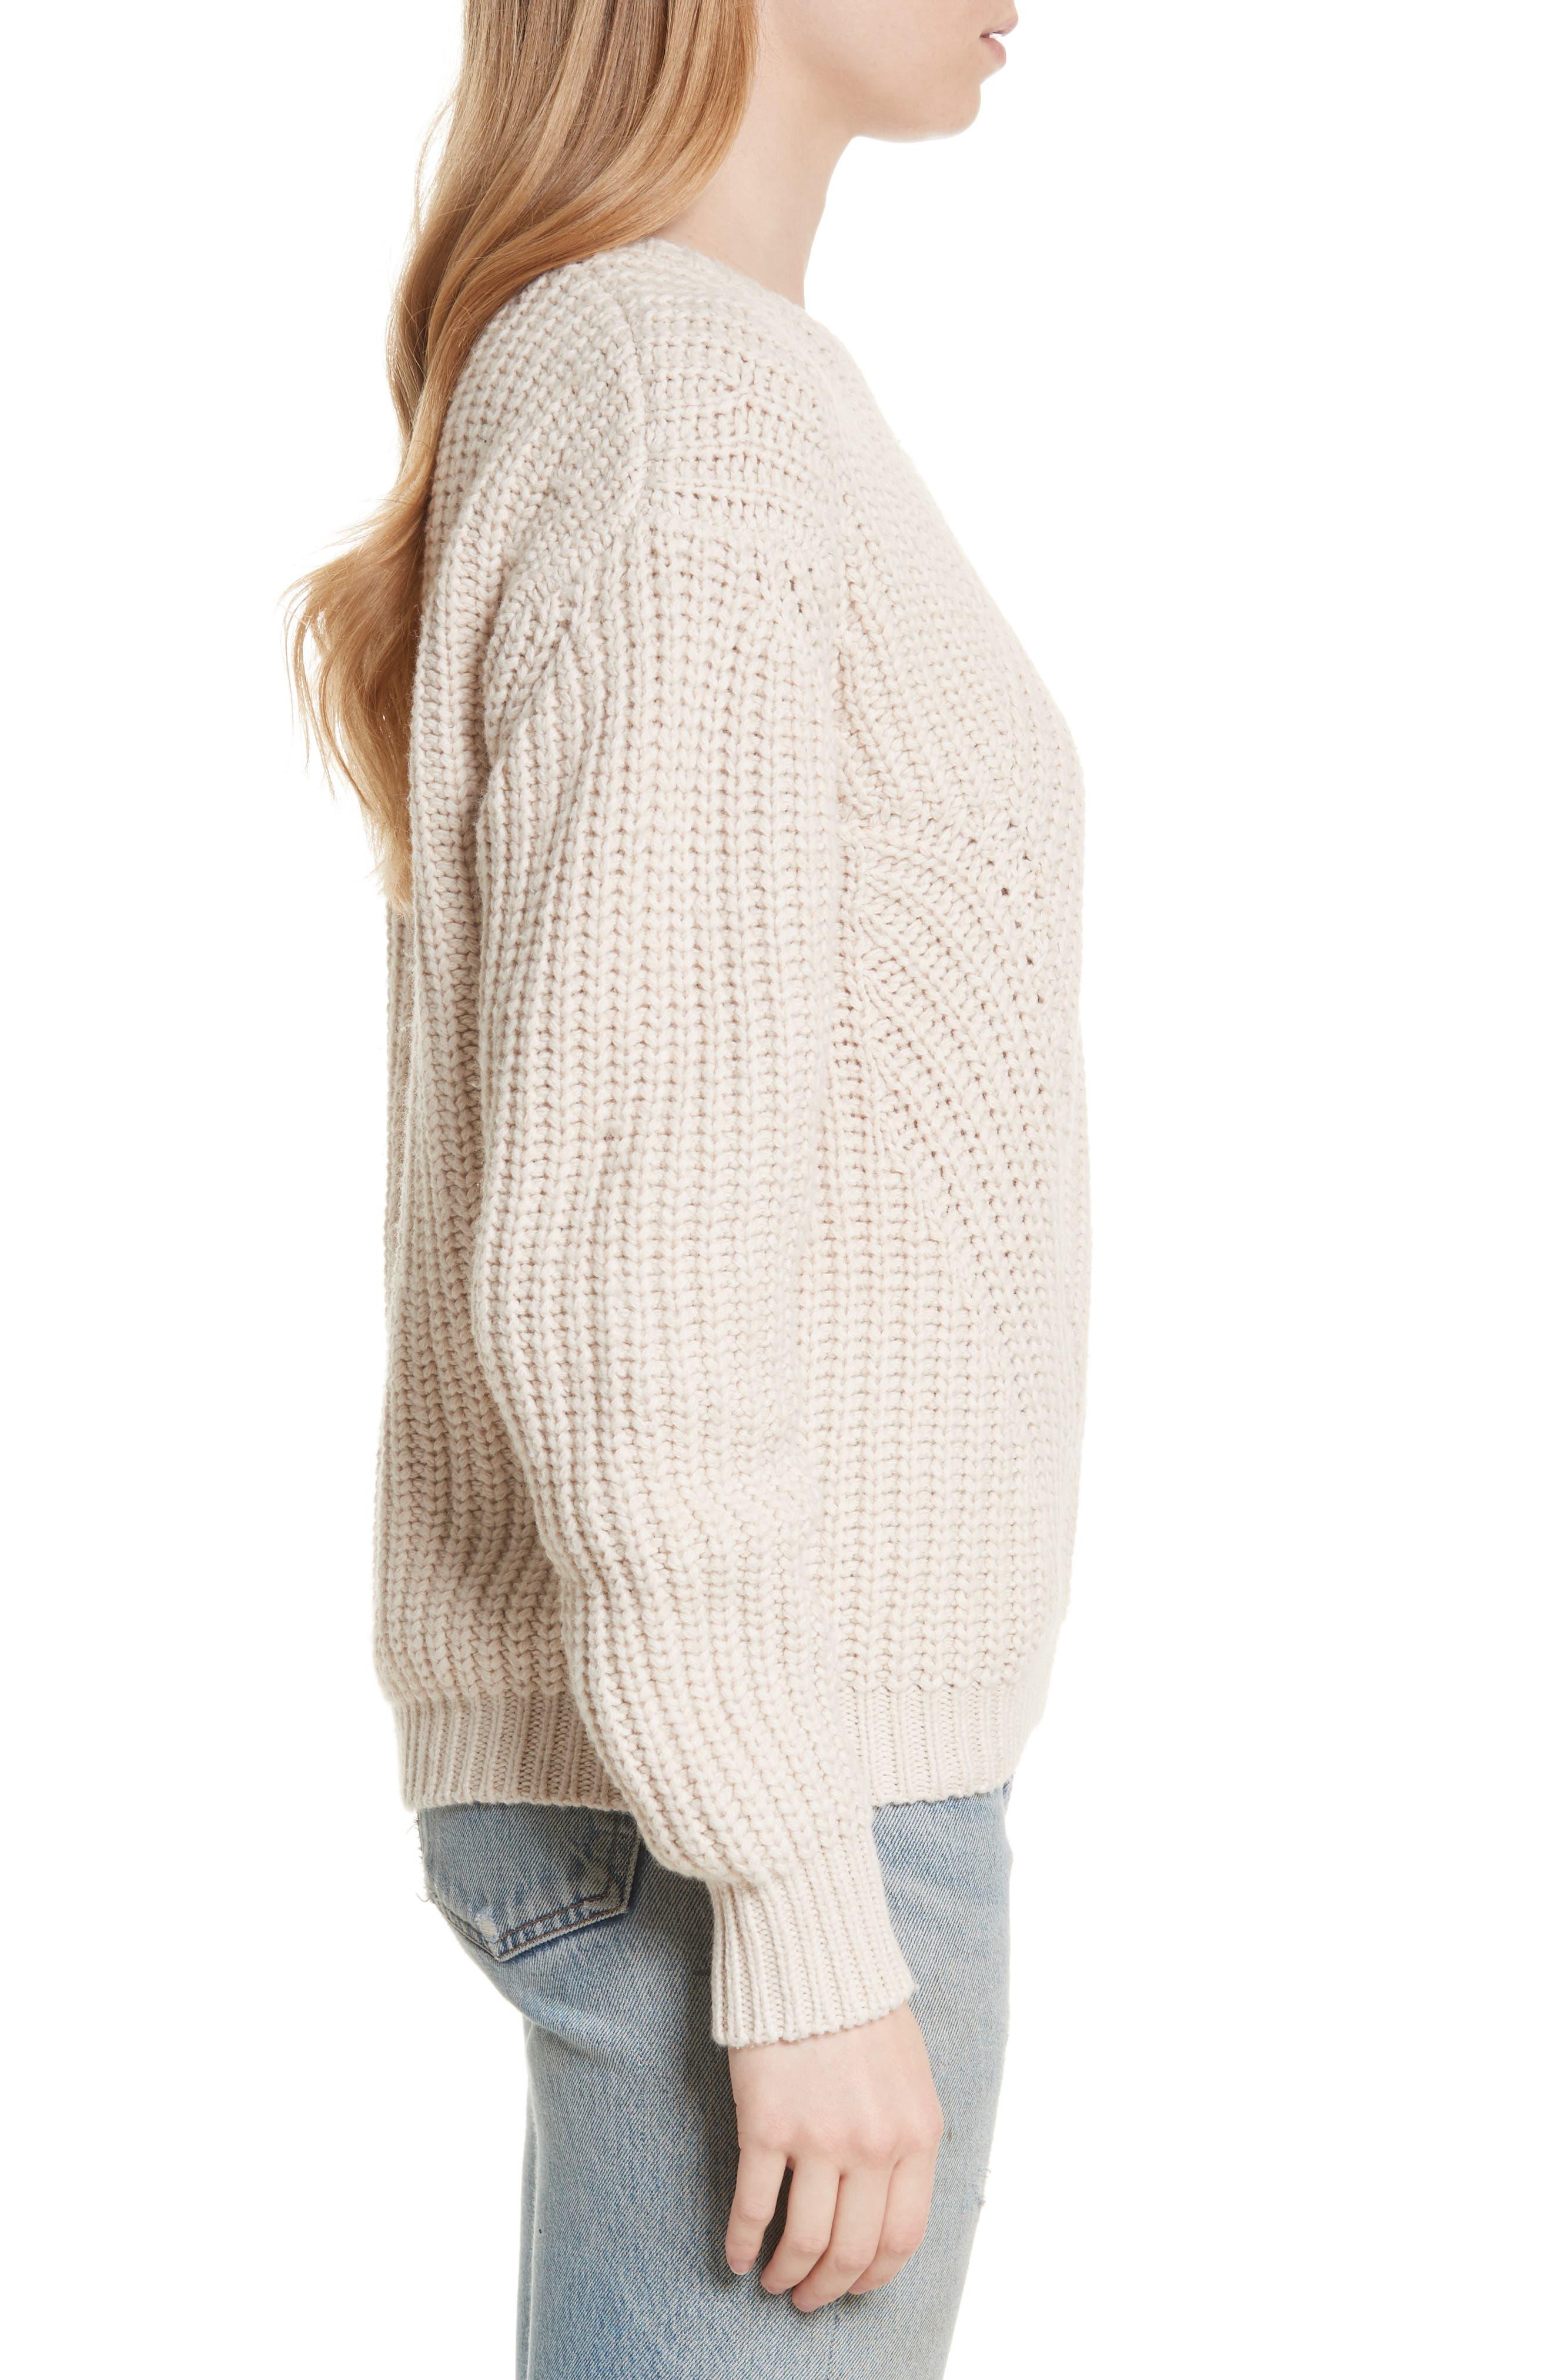 Balenne Sweater,                             Alternate thumbnail 3, color,                             277